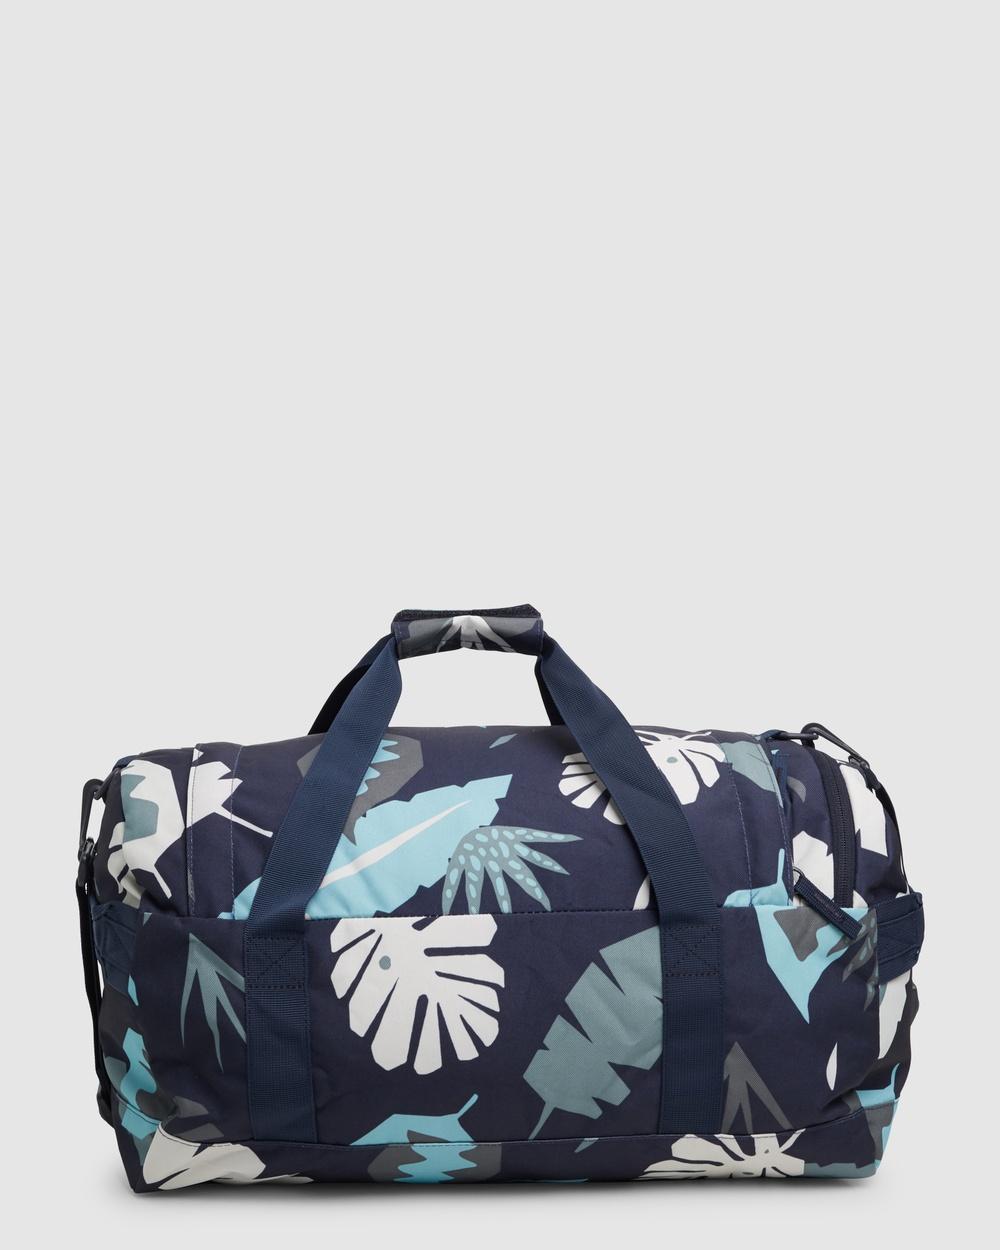 Dakine Eq Duffle 35 L Bag Bags ABSTRACT PAL Australia